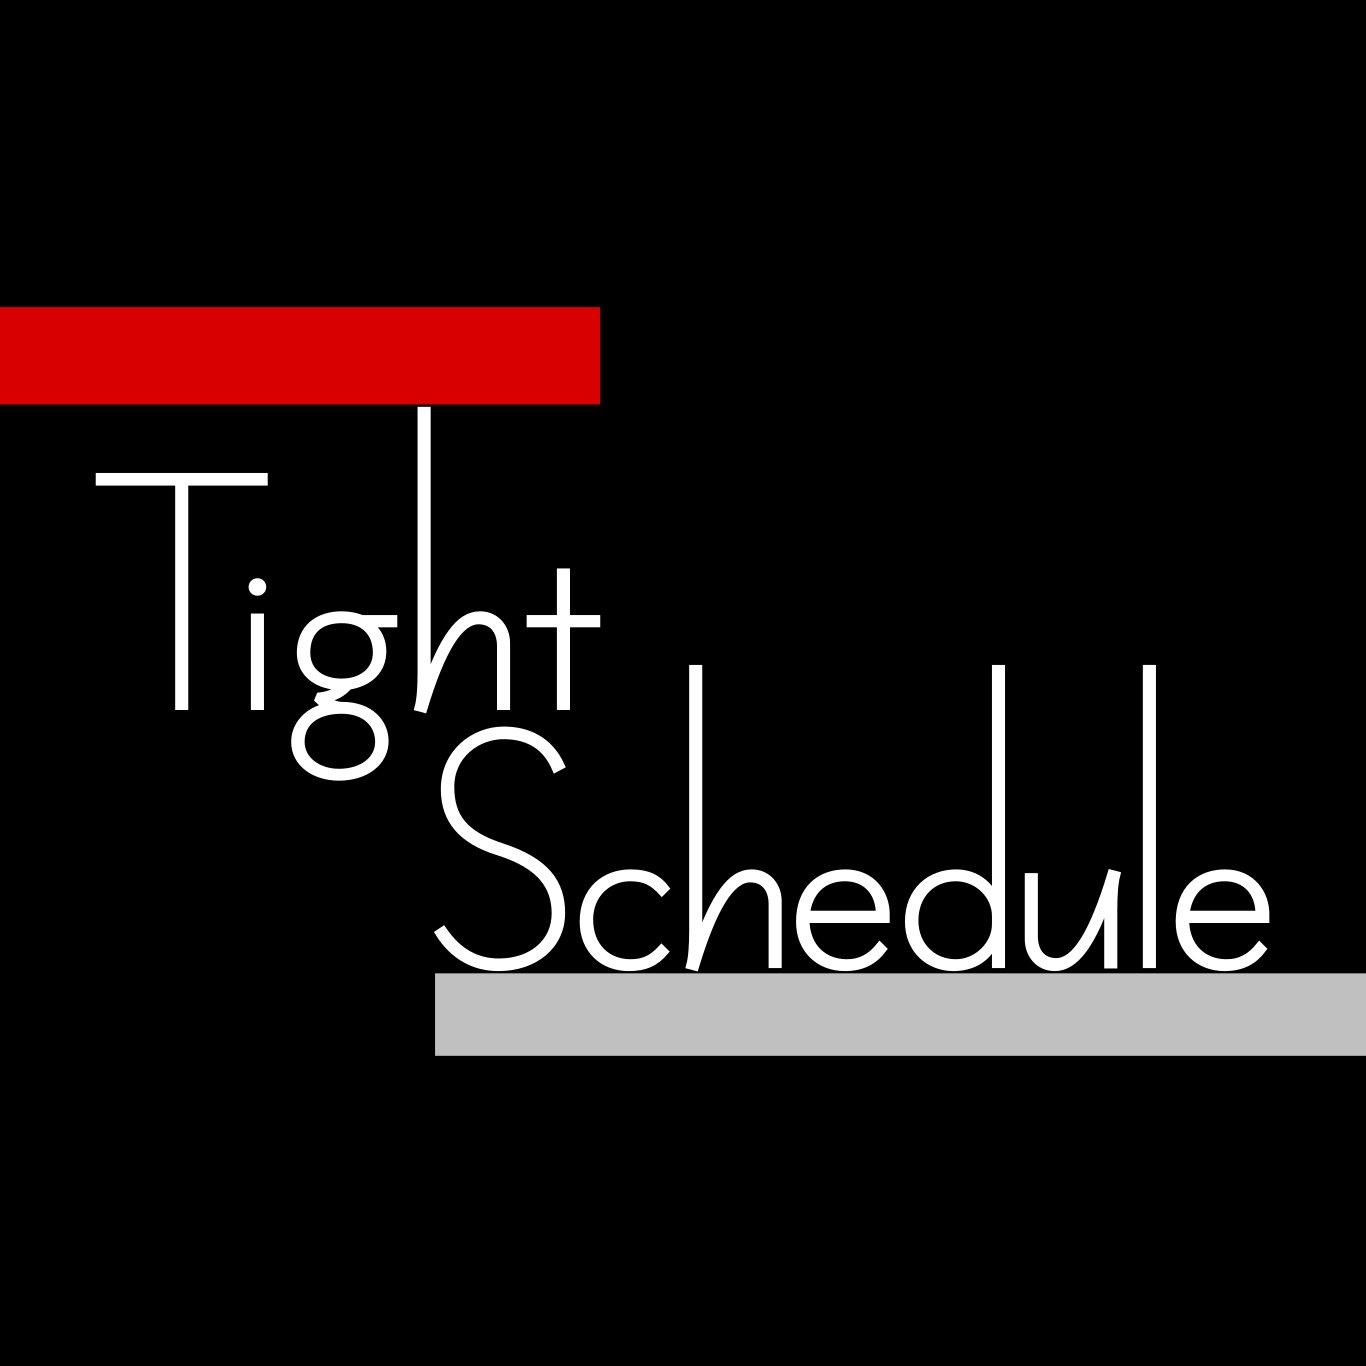 Tight Schedule UK